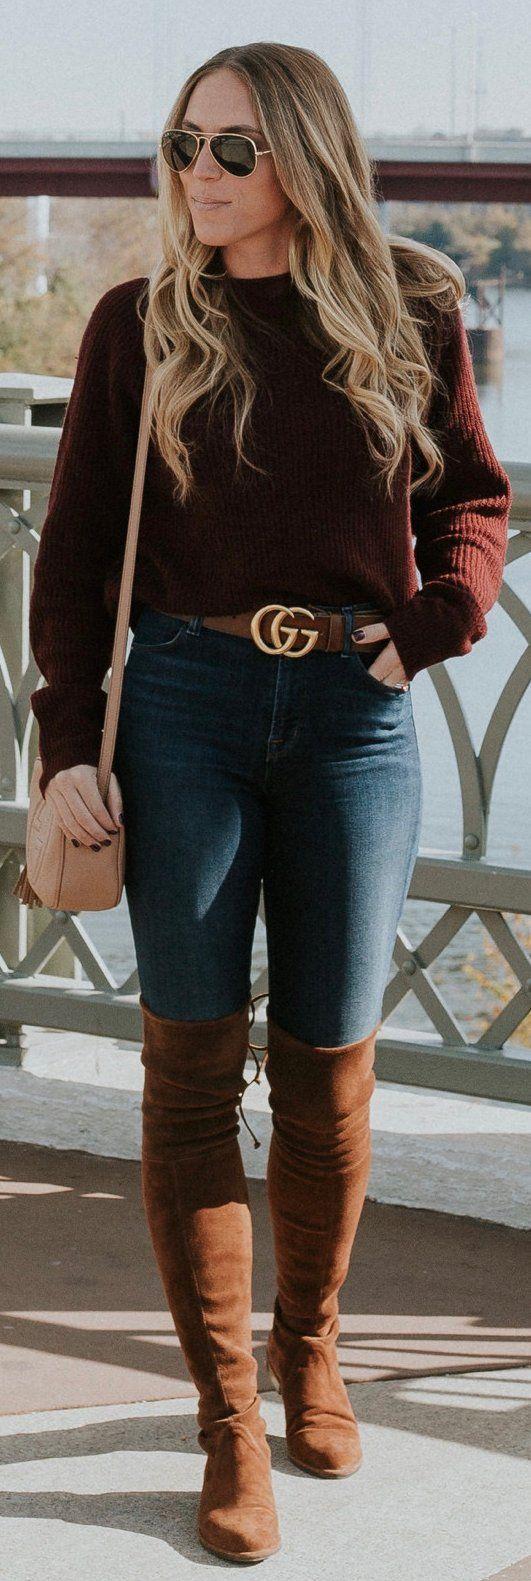 Brown Knit / Navy Skinny Jeans / Brown Velvet OTK Boots